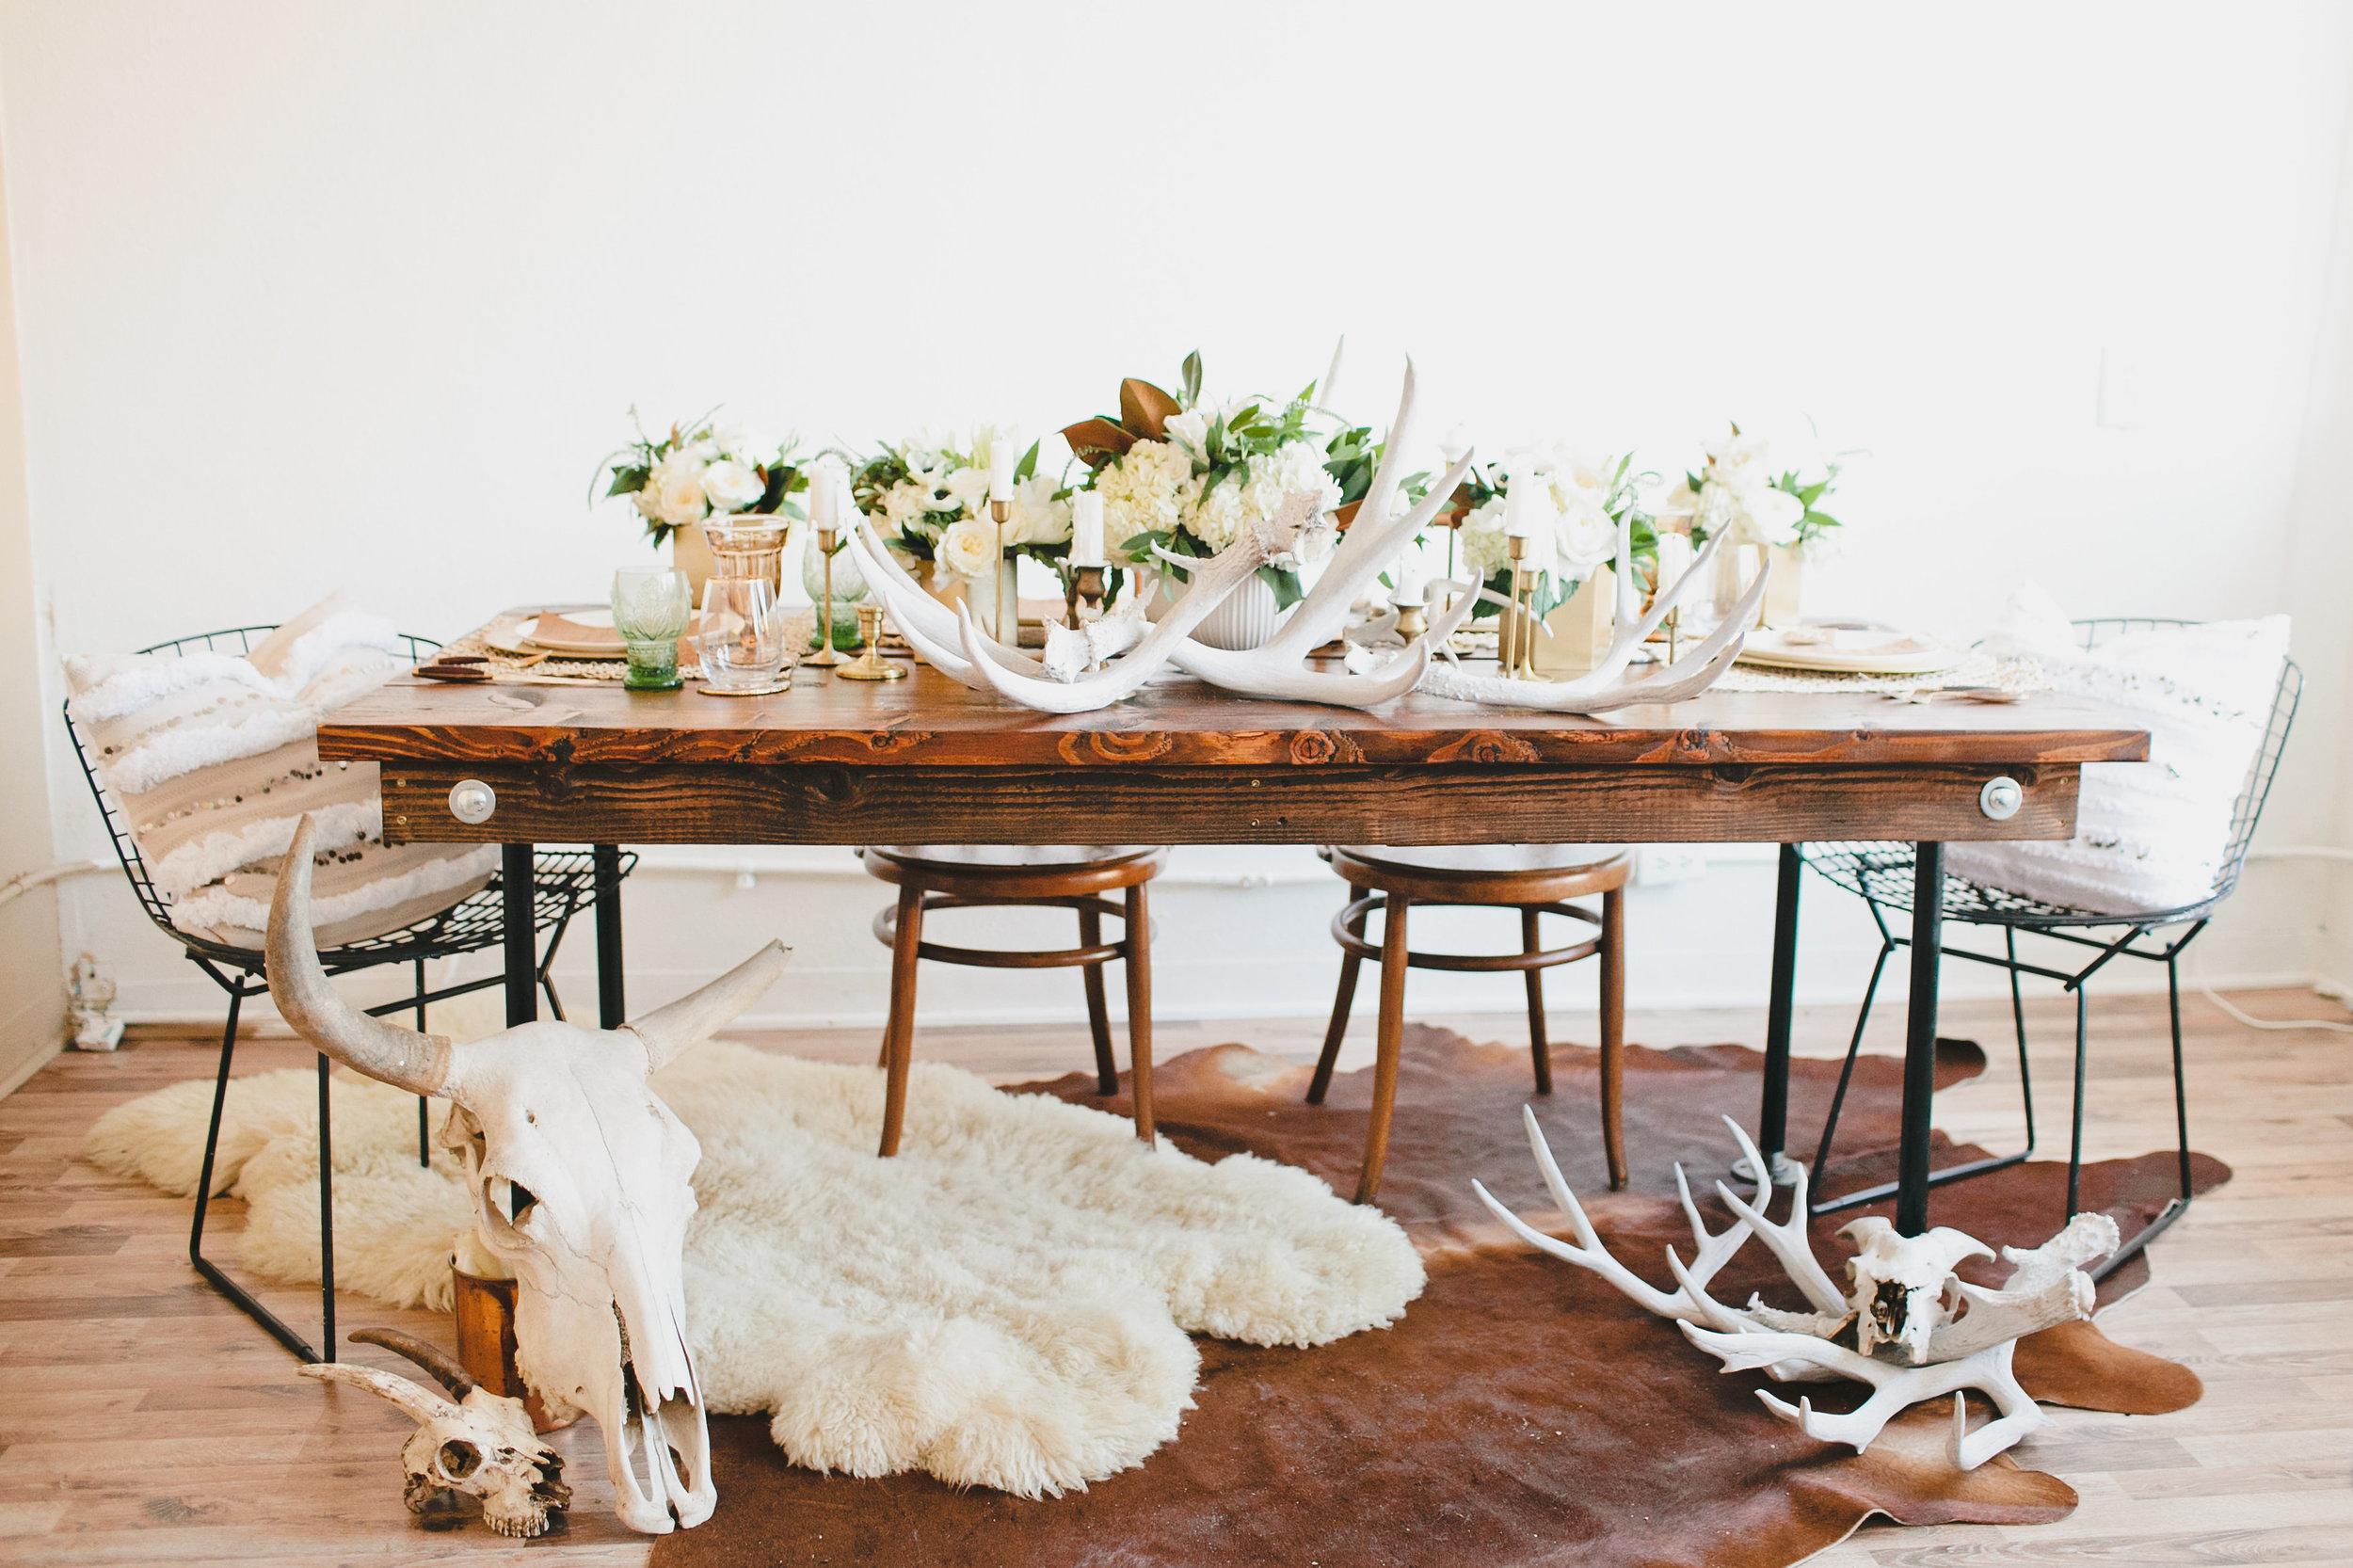 Midcentury Christmas table